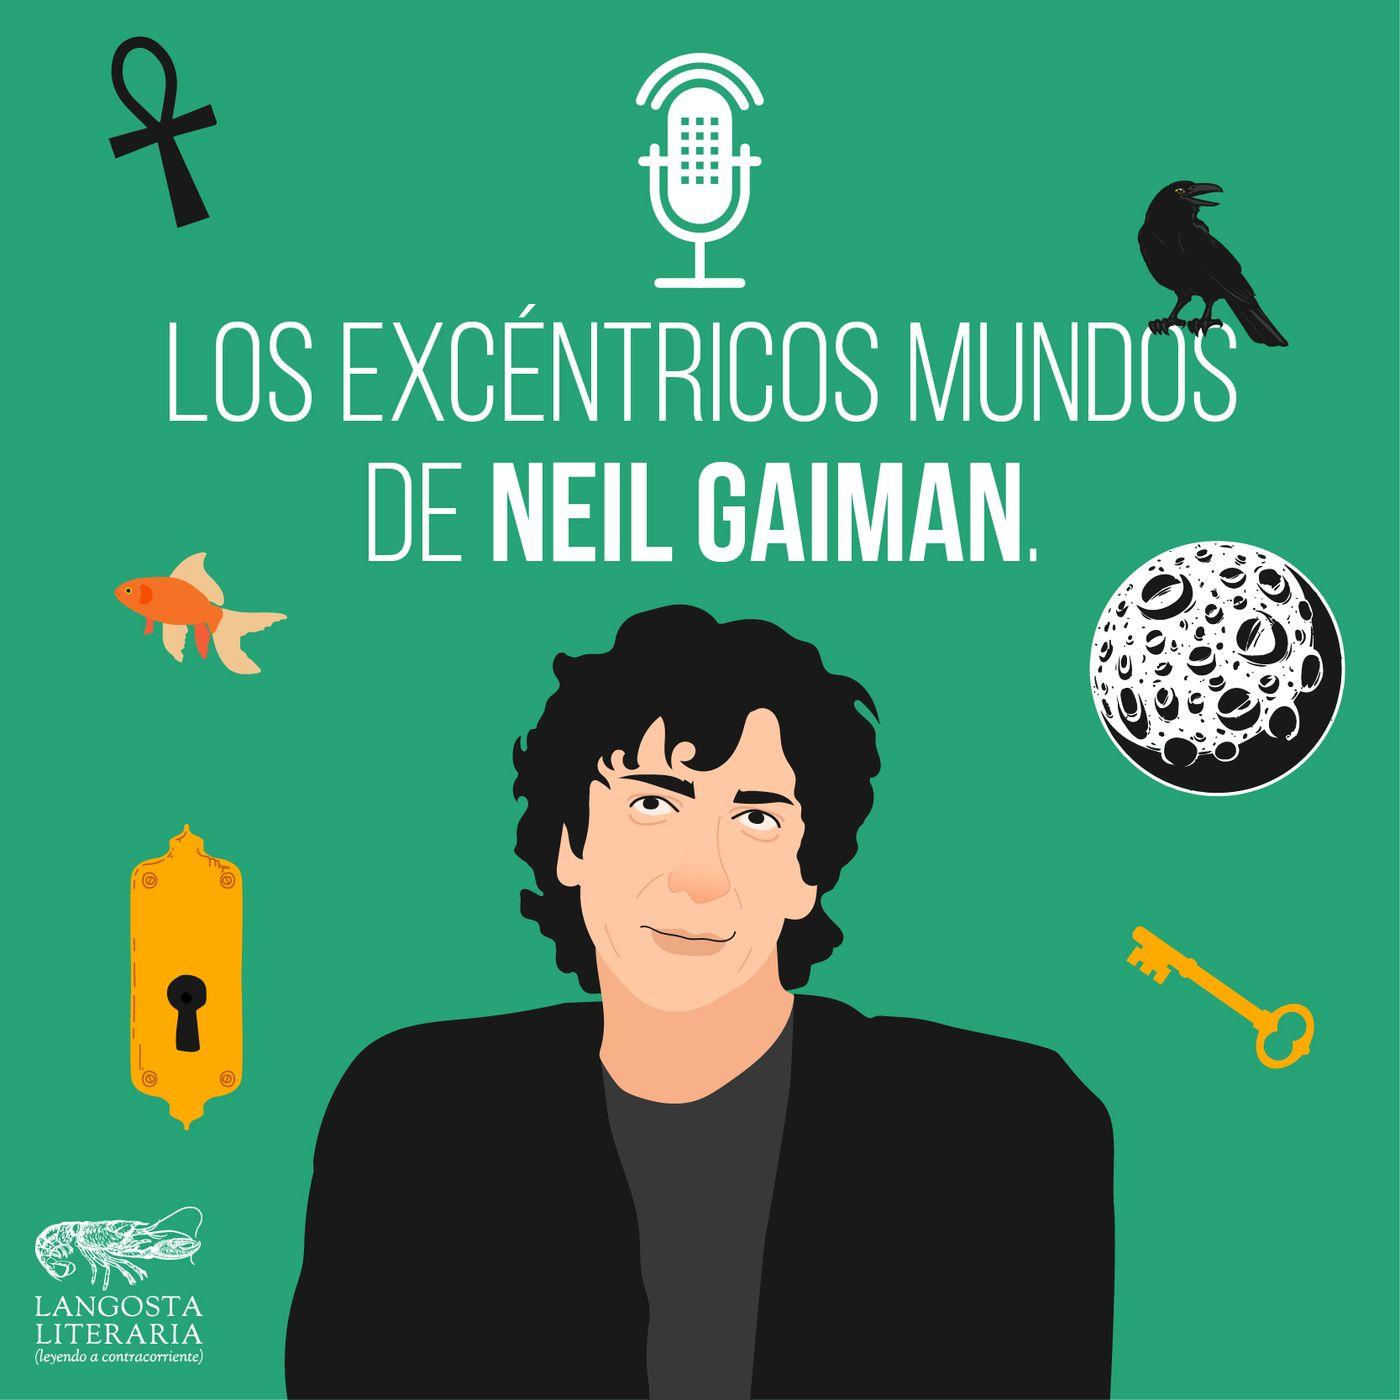 Los excéntricos mundos de Neil Gaiman